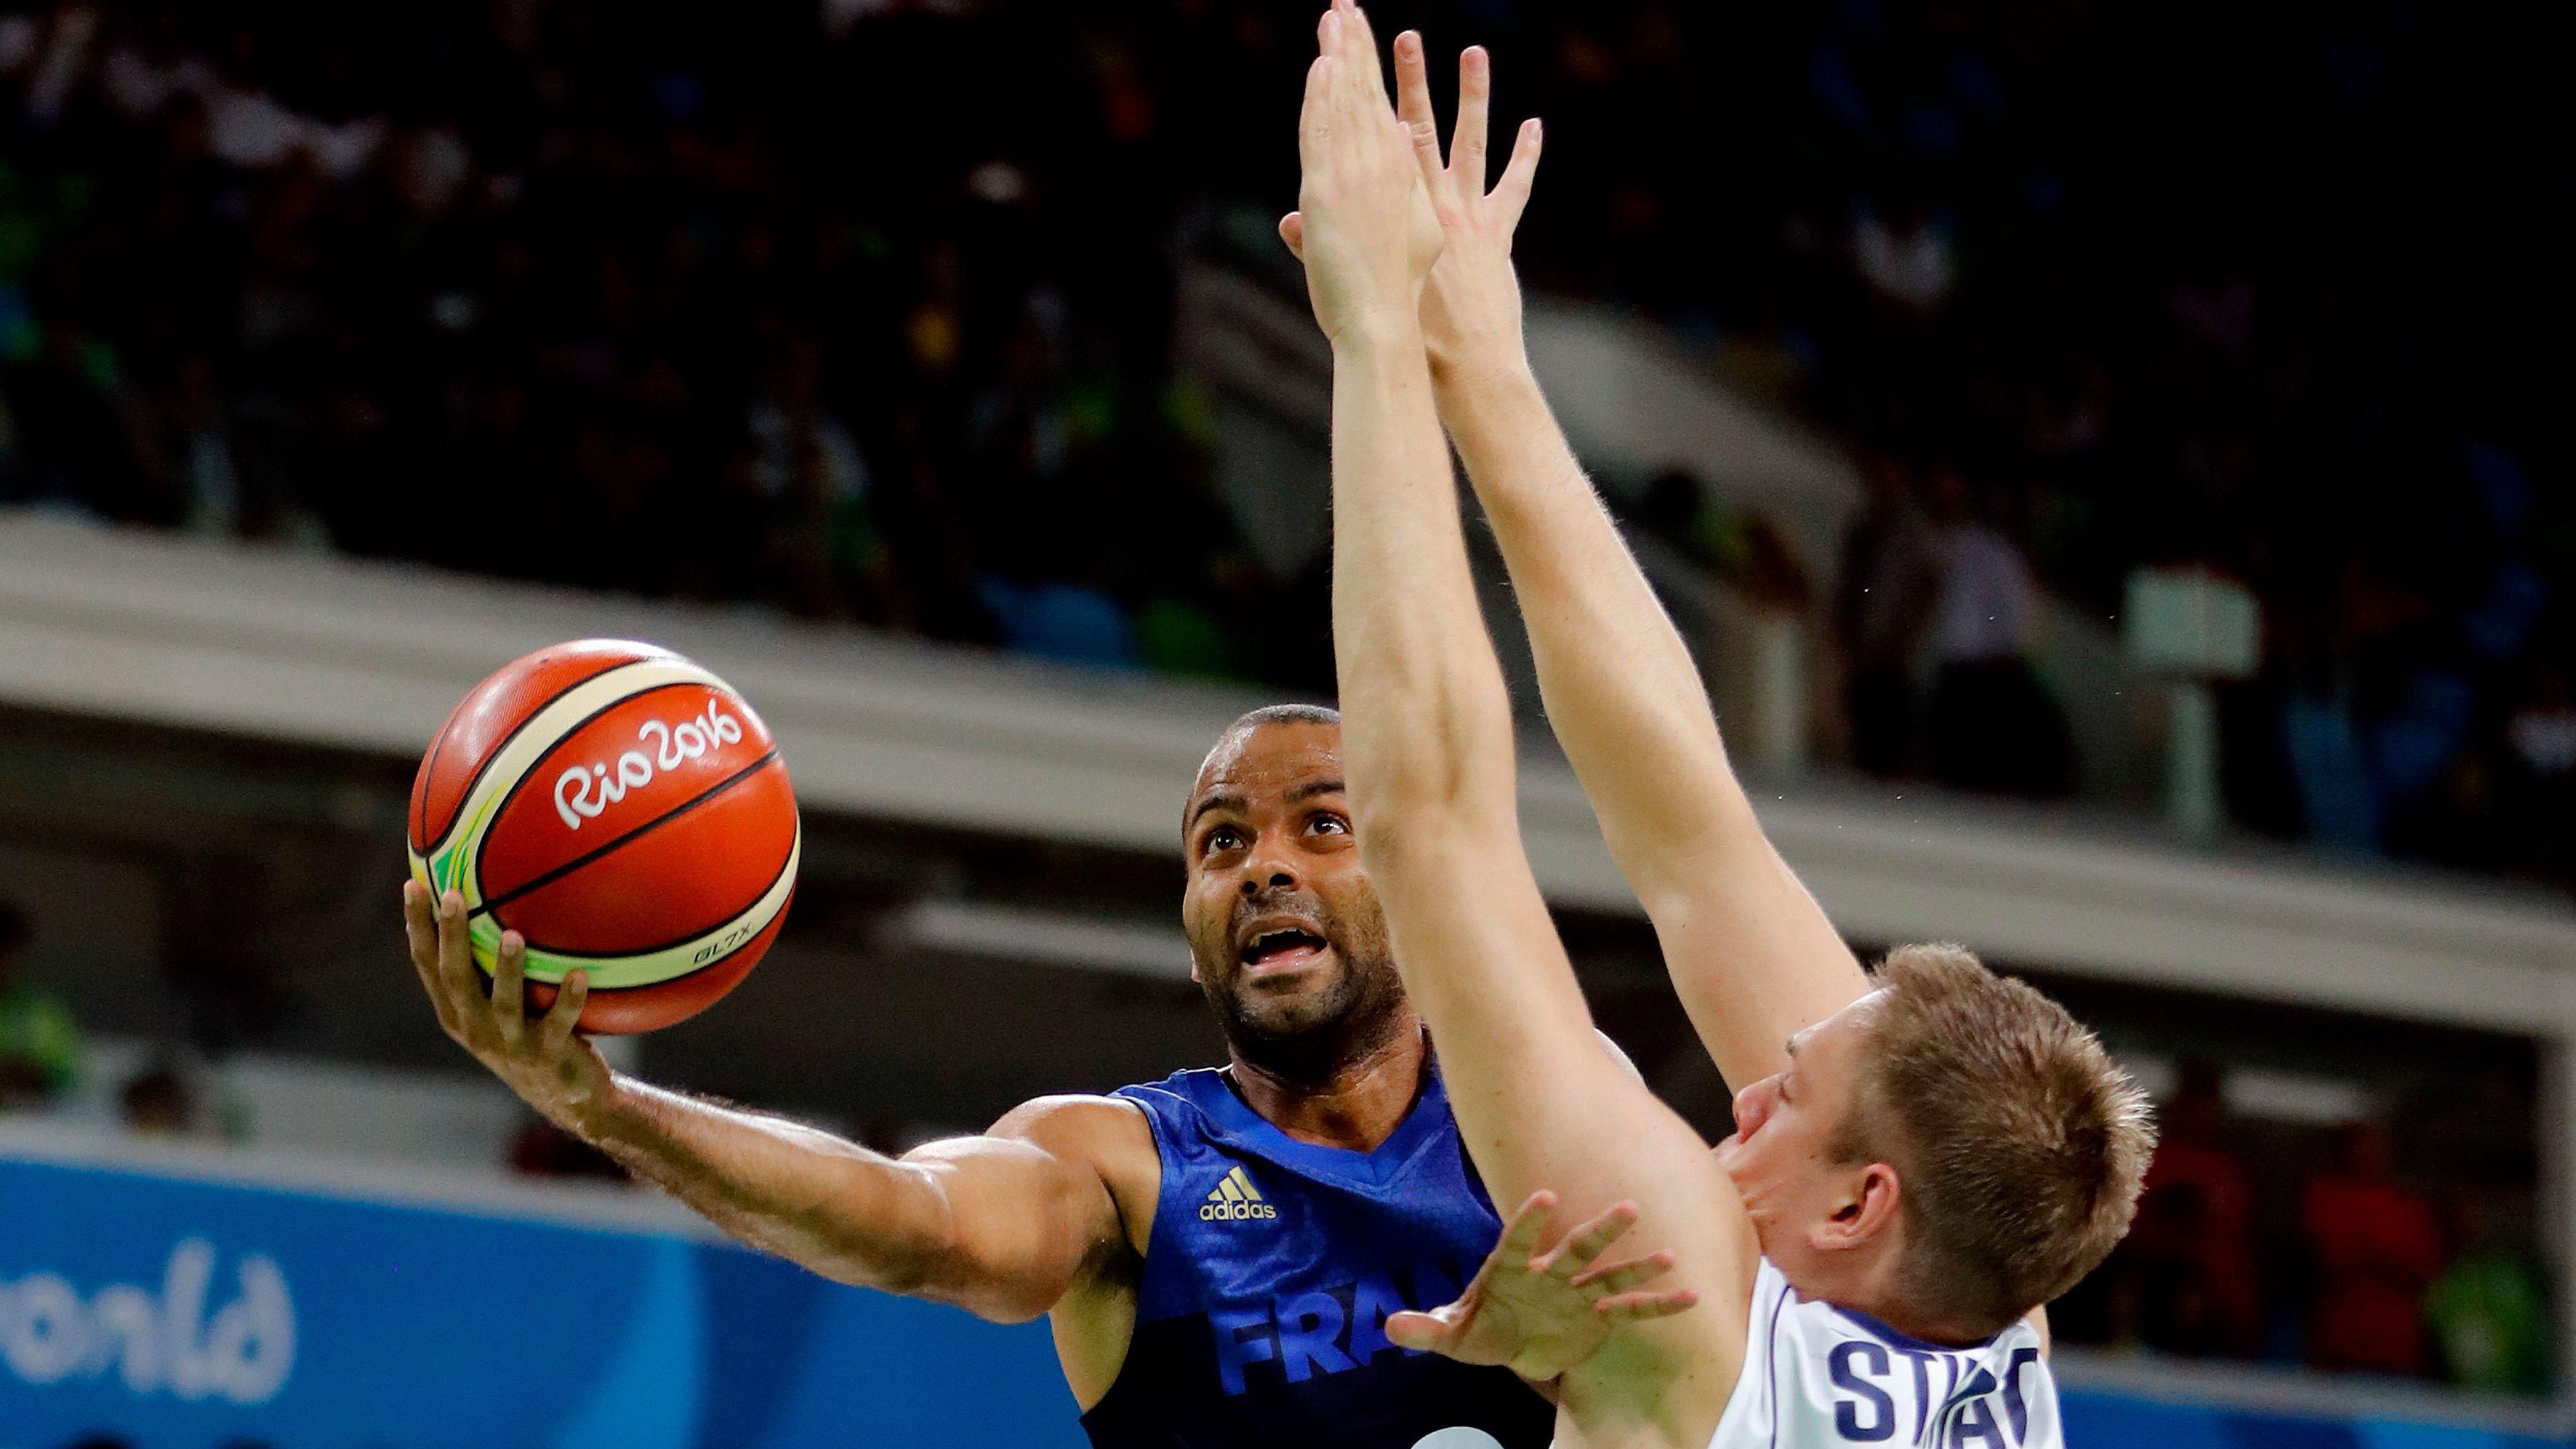 Francia vence a Serbia por 76-75 con canasta de Parker